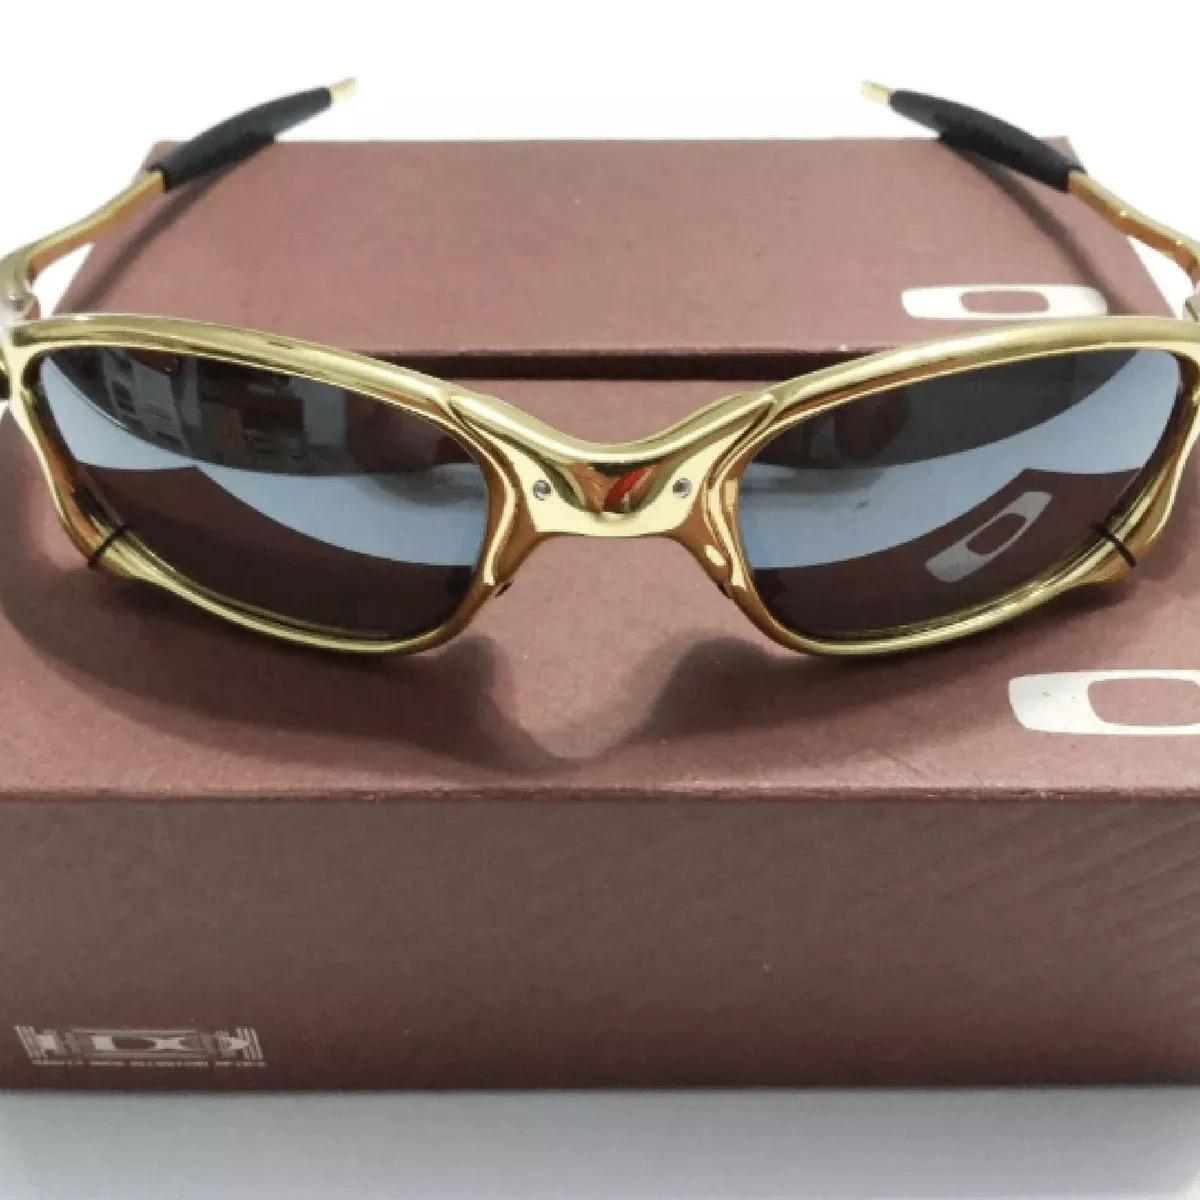 4e1a7cd082094 Lupa Oakley 24k Juliet Double X Dourada Black Frete Gratis - R  165 ...